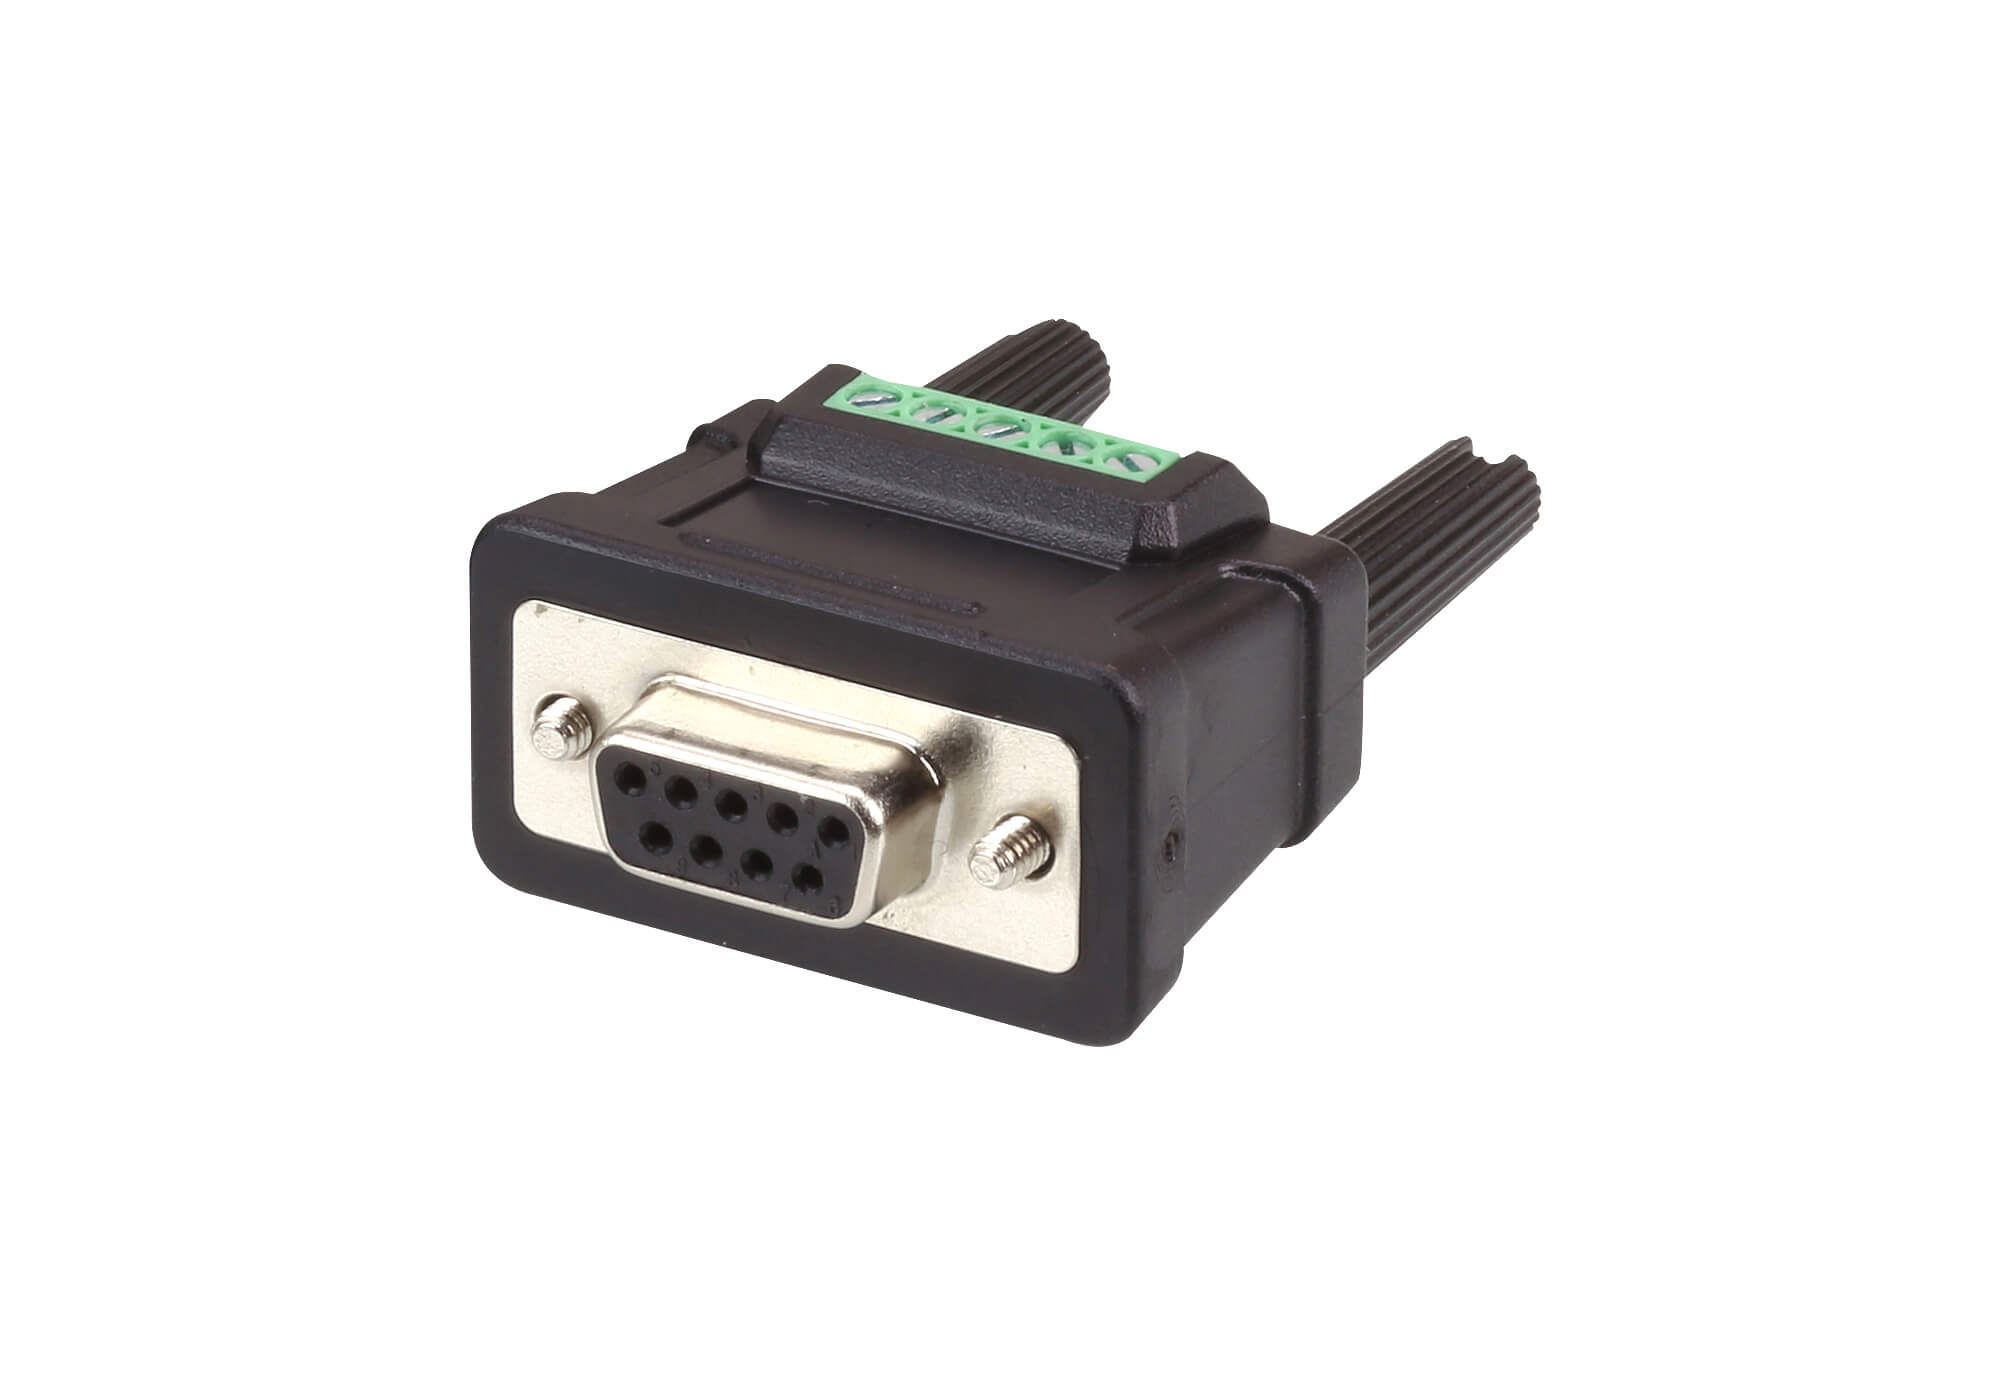 USB auf RS-422/485 Adapter - UC485, ATEN USB-Konverter